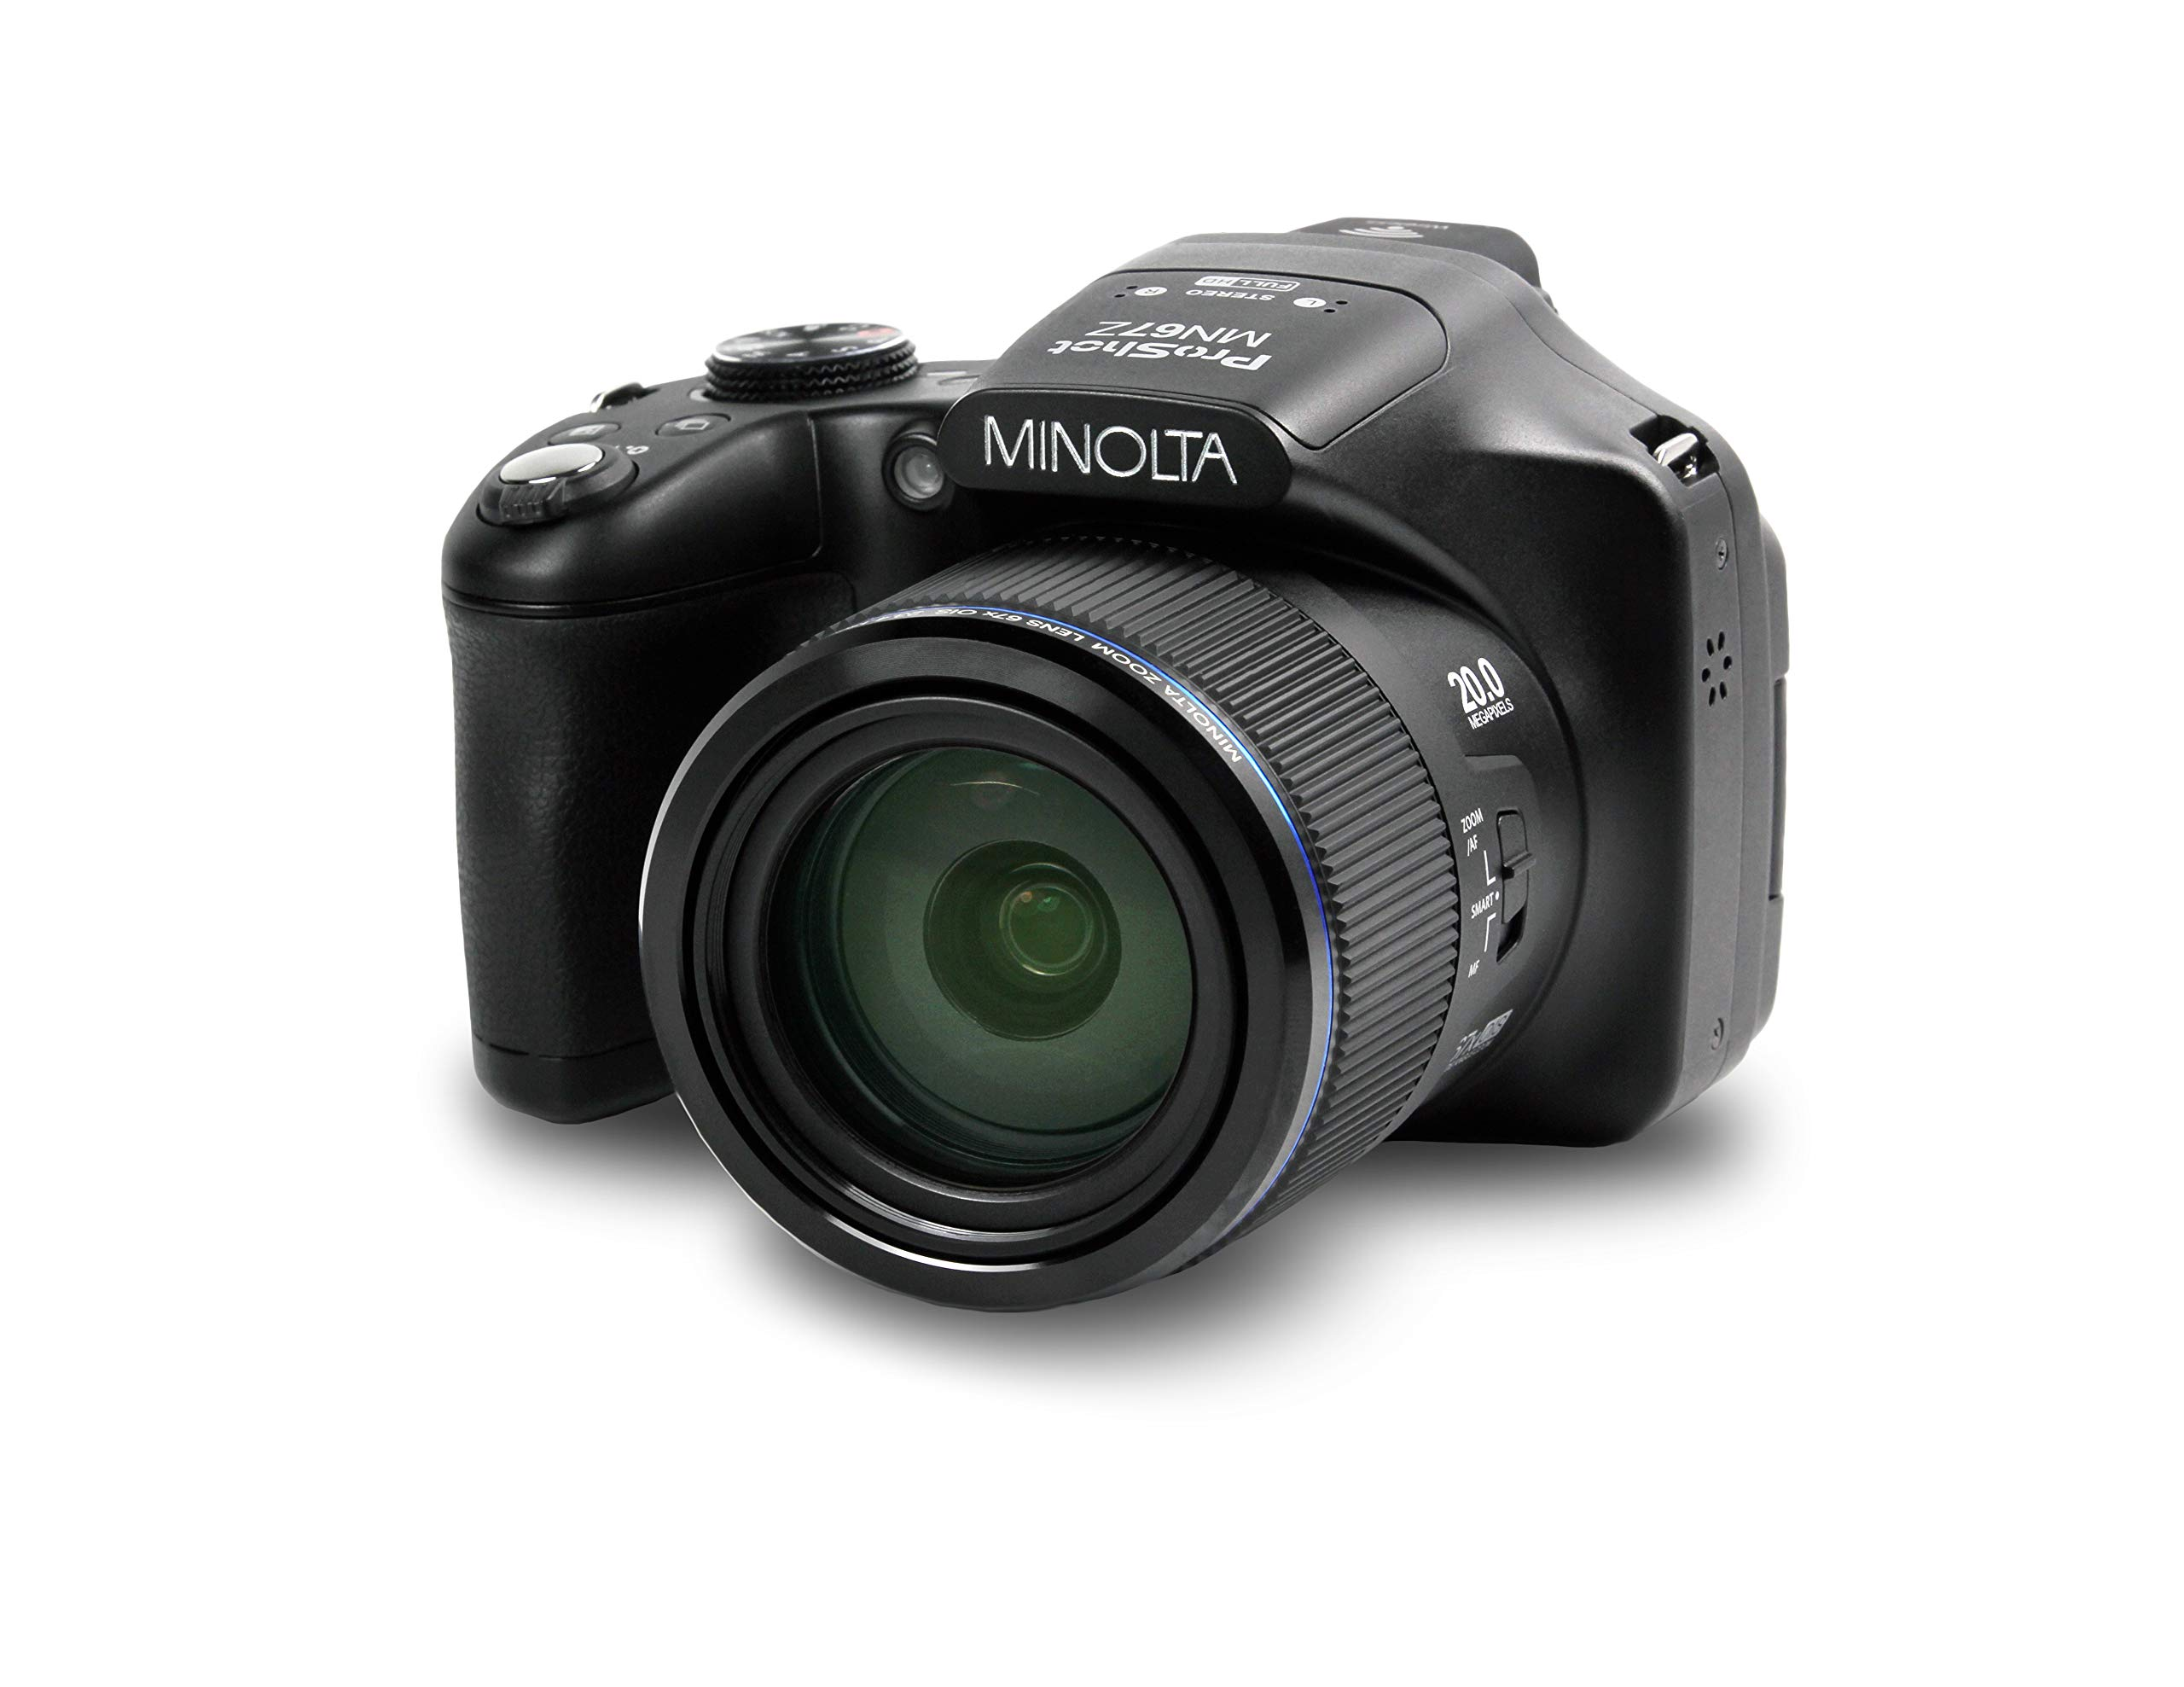 Minolta Pro Shot 20 Mega Pixel HD Digital Camera with 67X Optical Zoom, Full 1080P HD Video & 16GB SD Card, Black